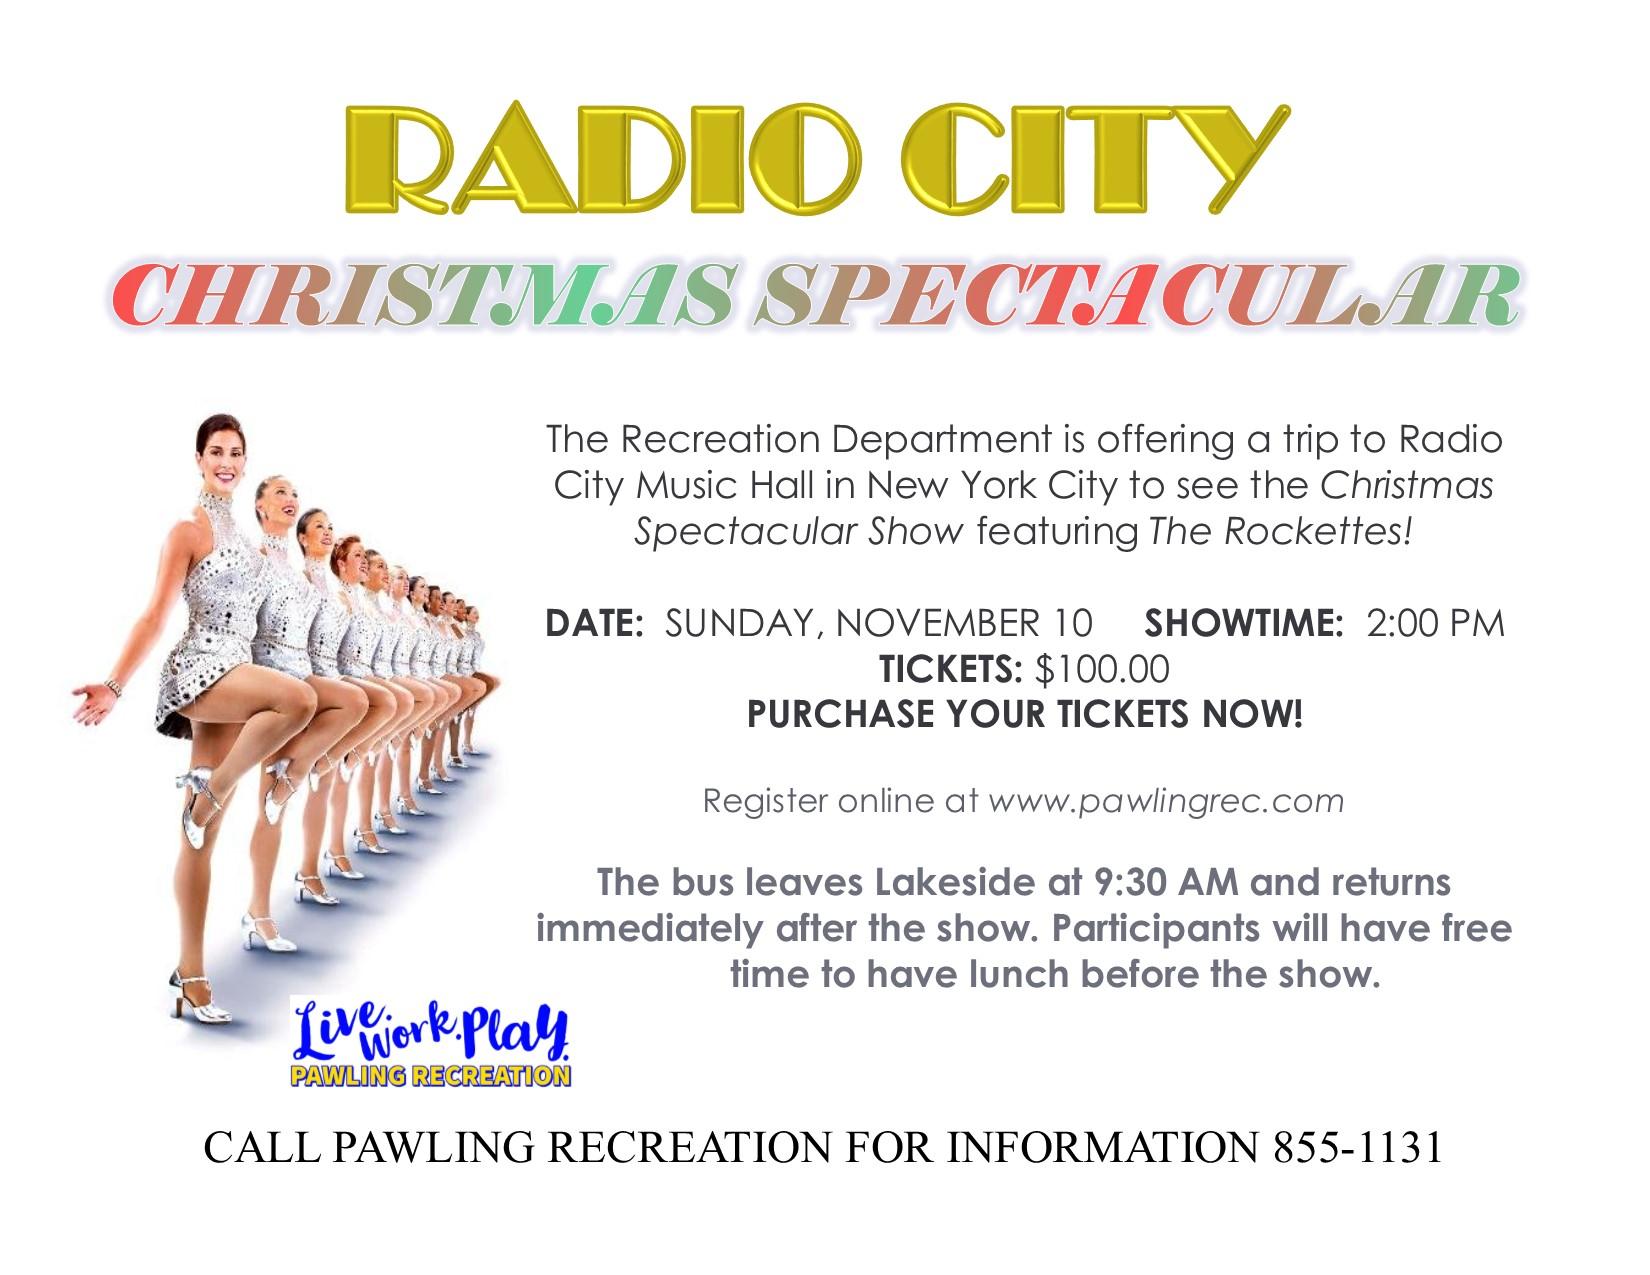 Radio City online dating